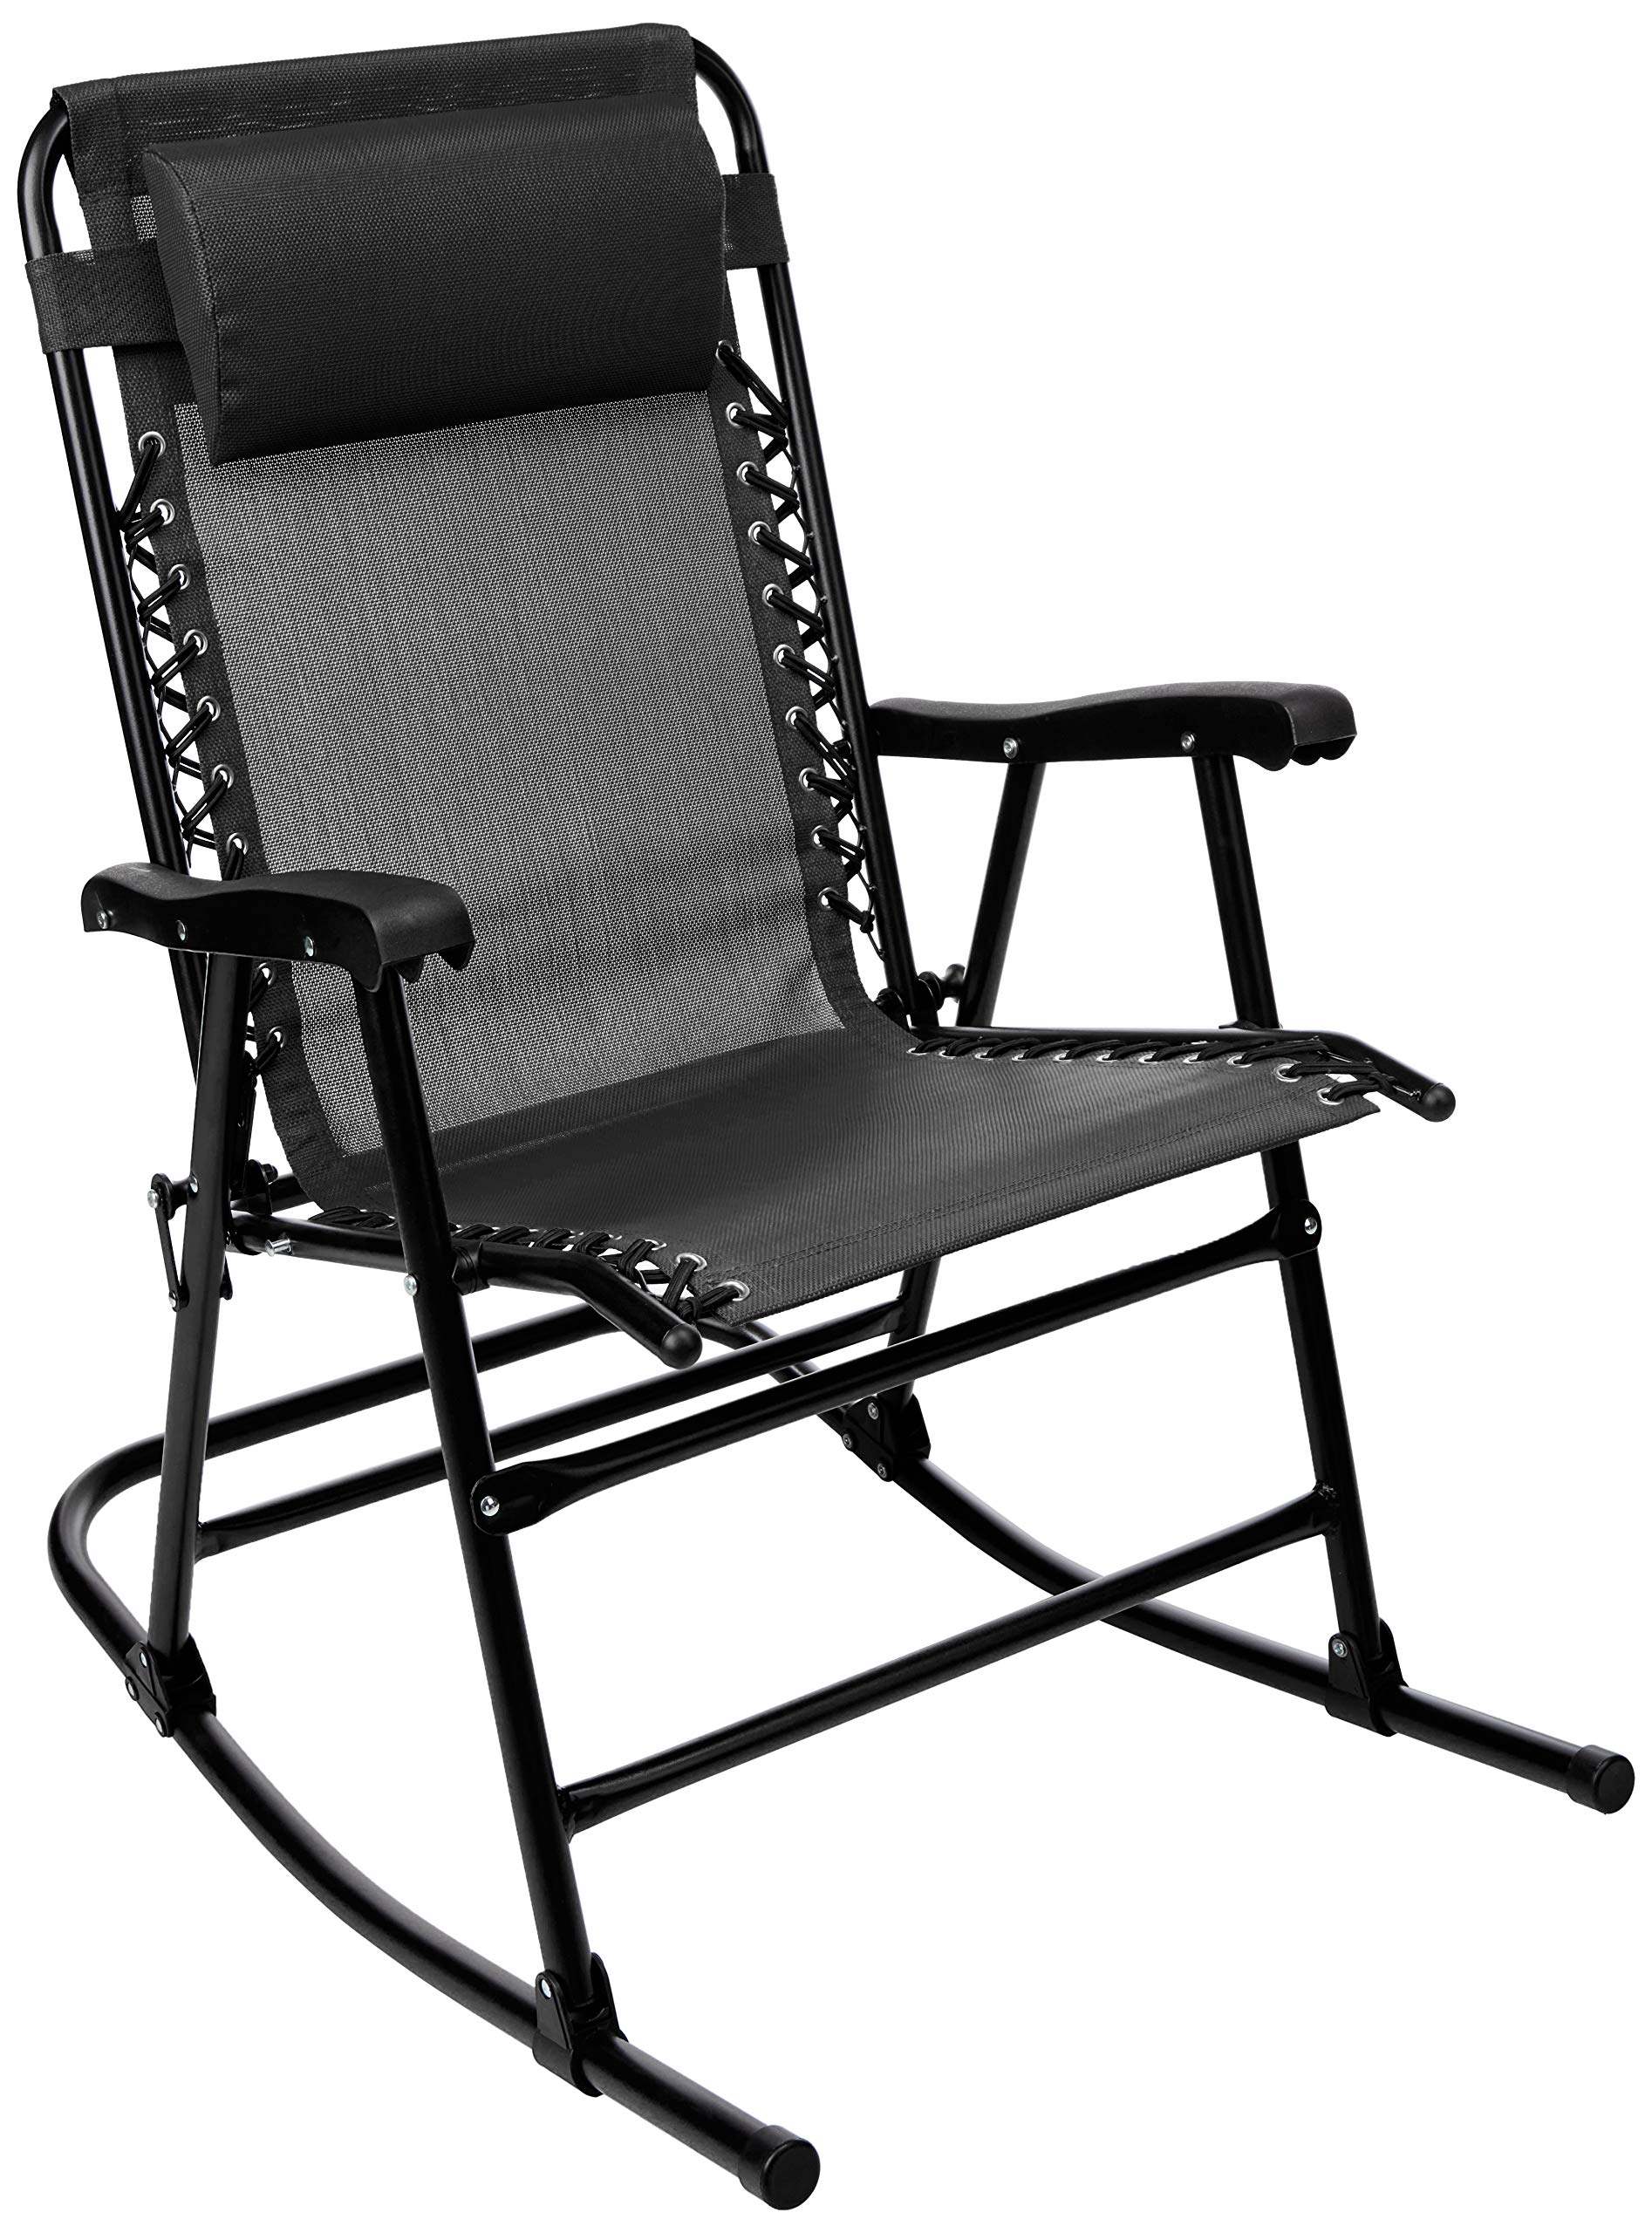 AmazonBasics Foldable Rocking Chair - Black by AmazonBasics